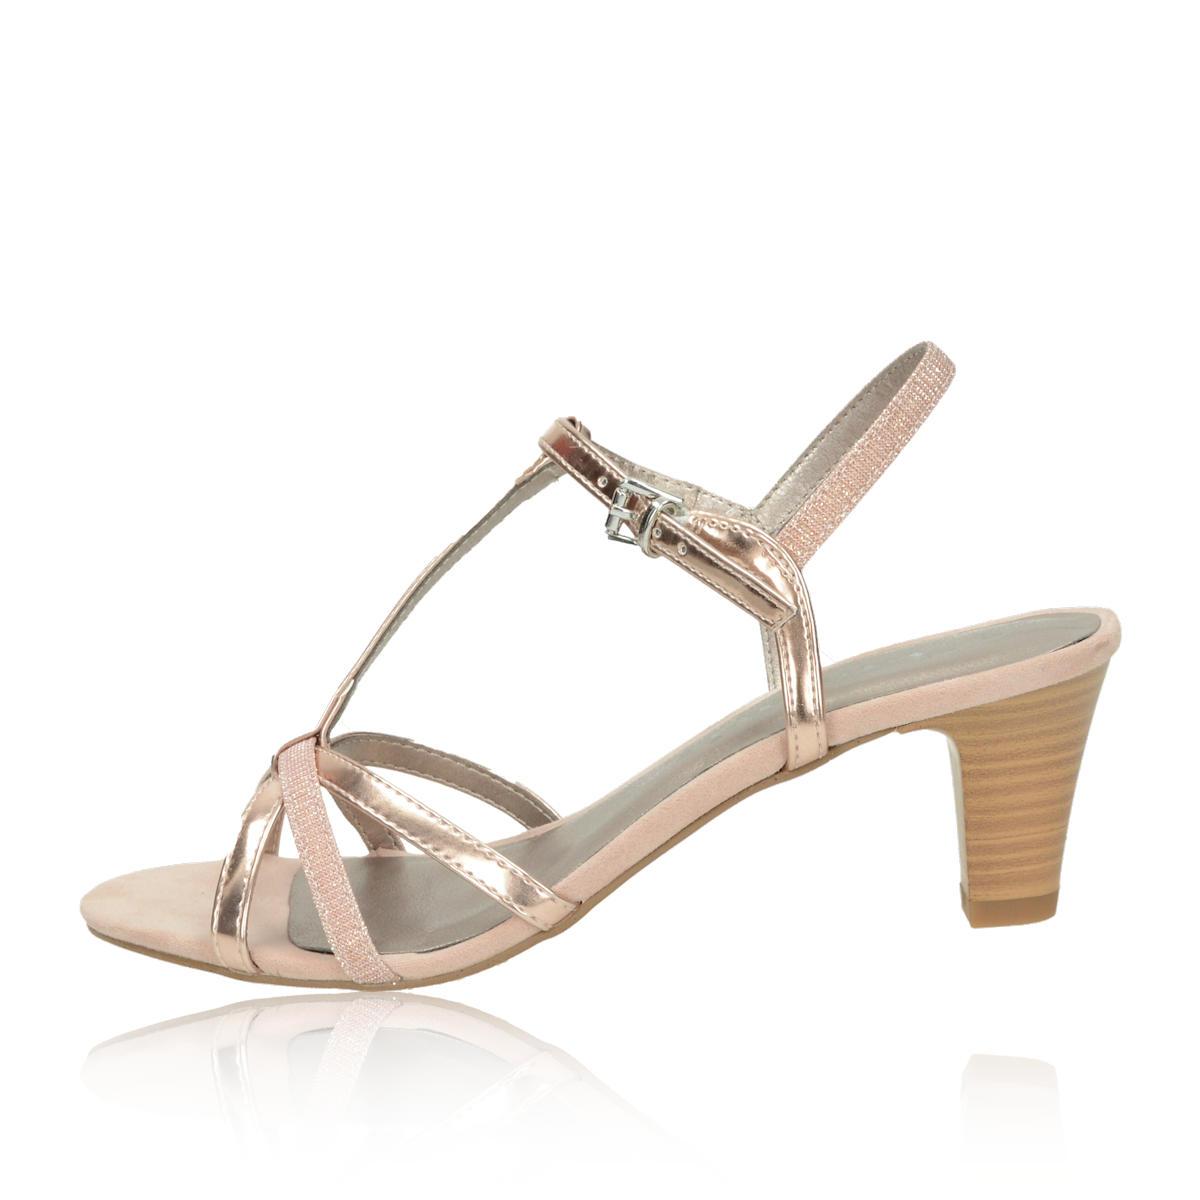 27bf0b3d51 Tamaris dámske sandále - ružové Tamaris dámske sandále - ružové ...